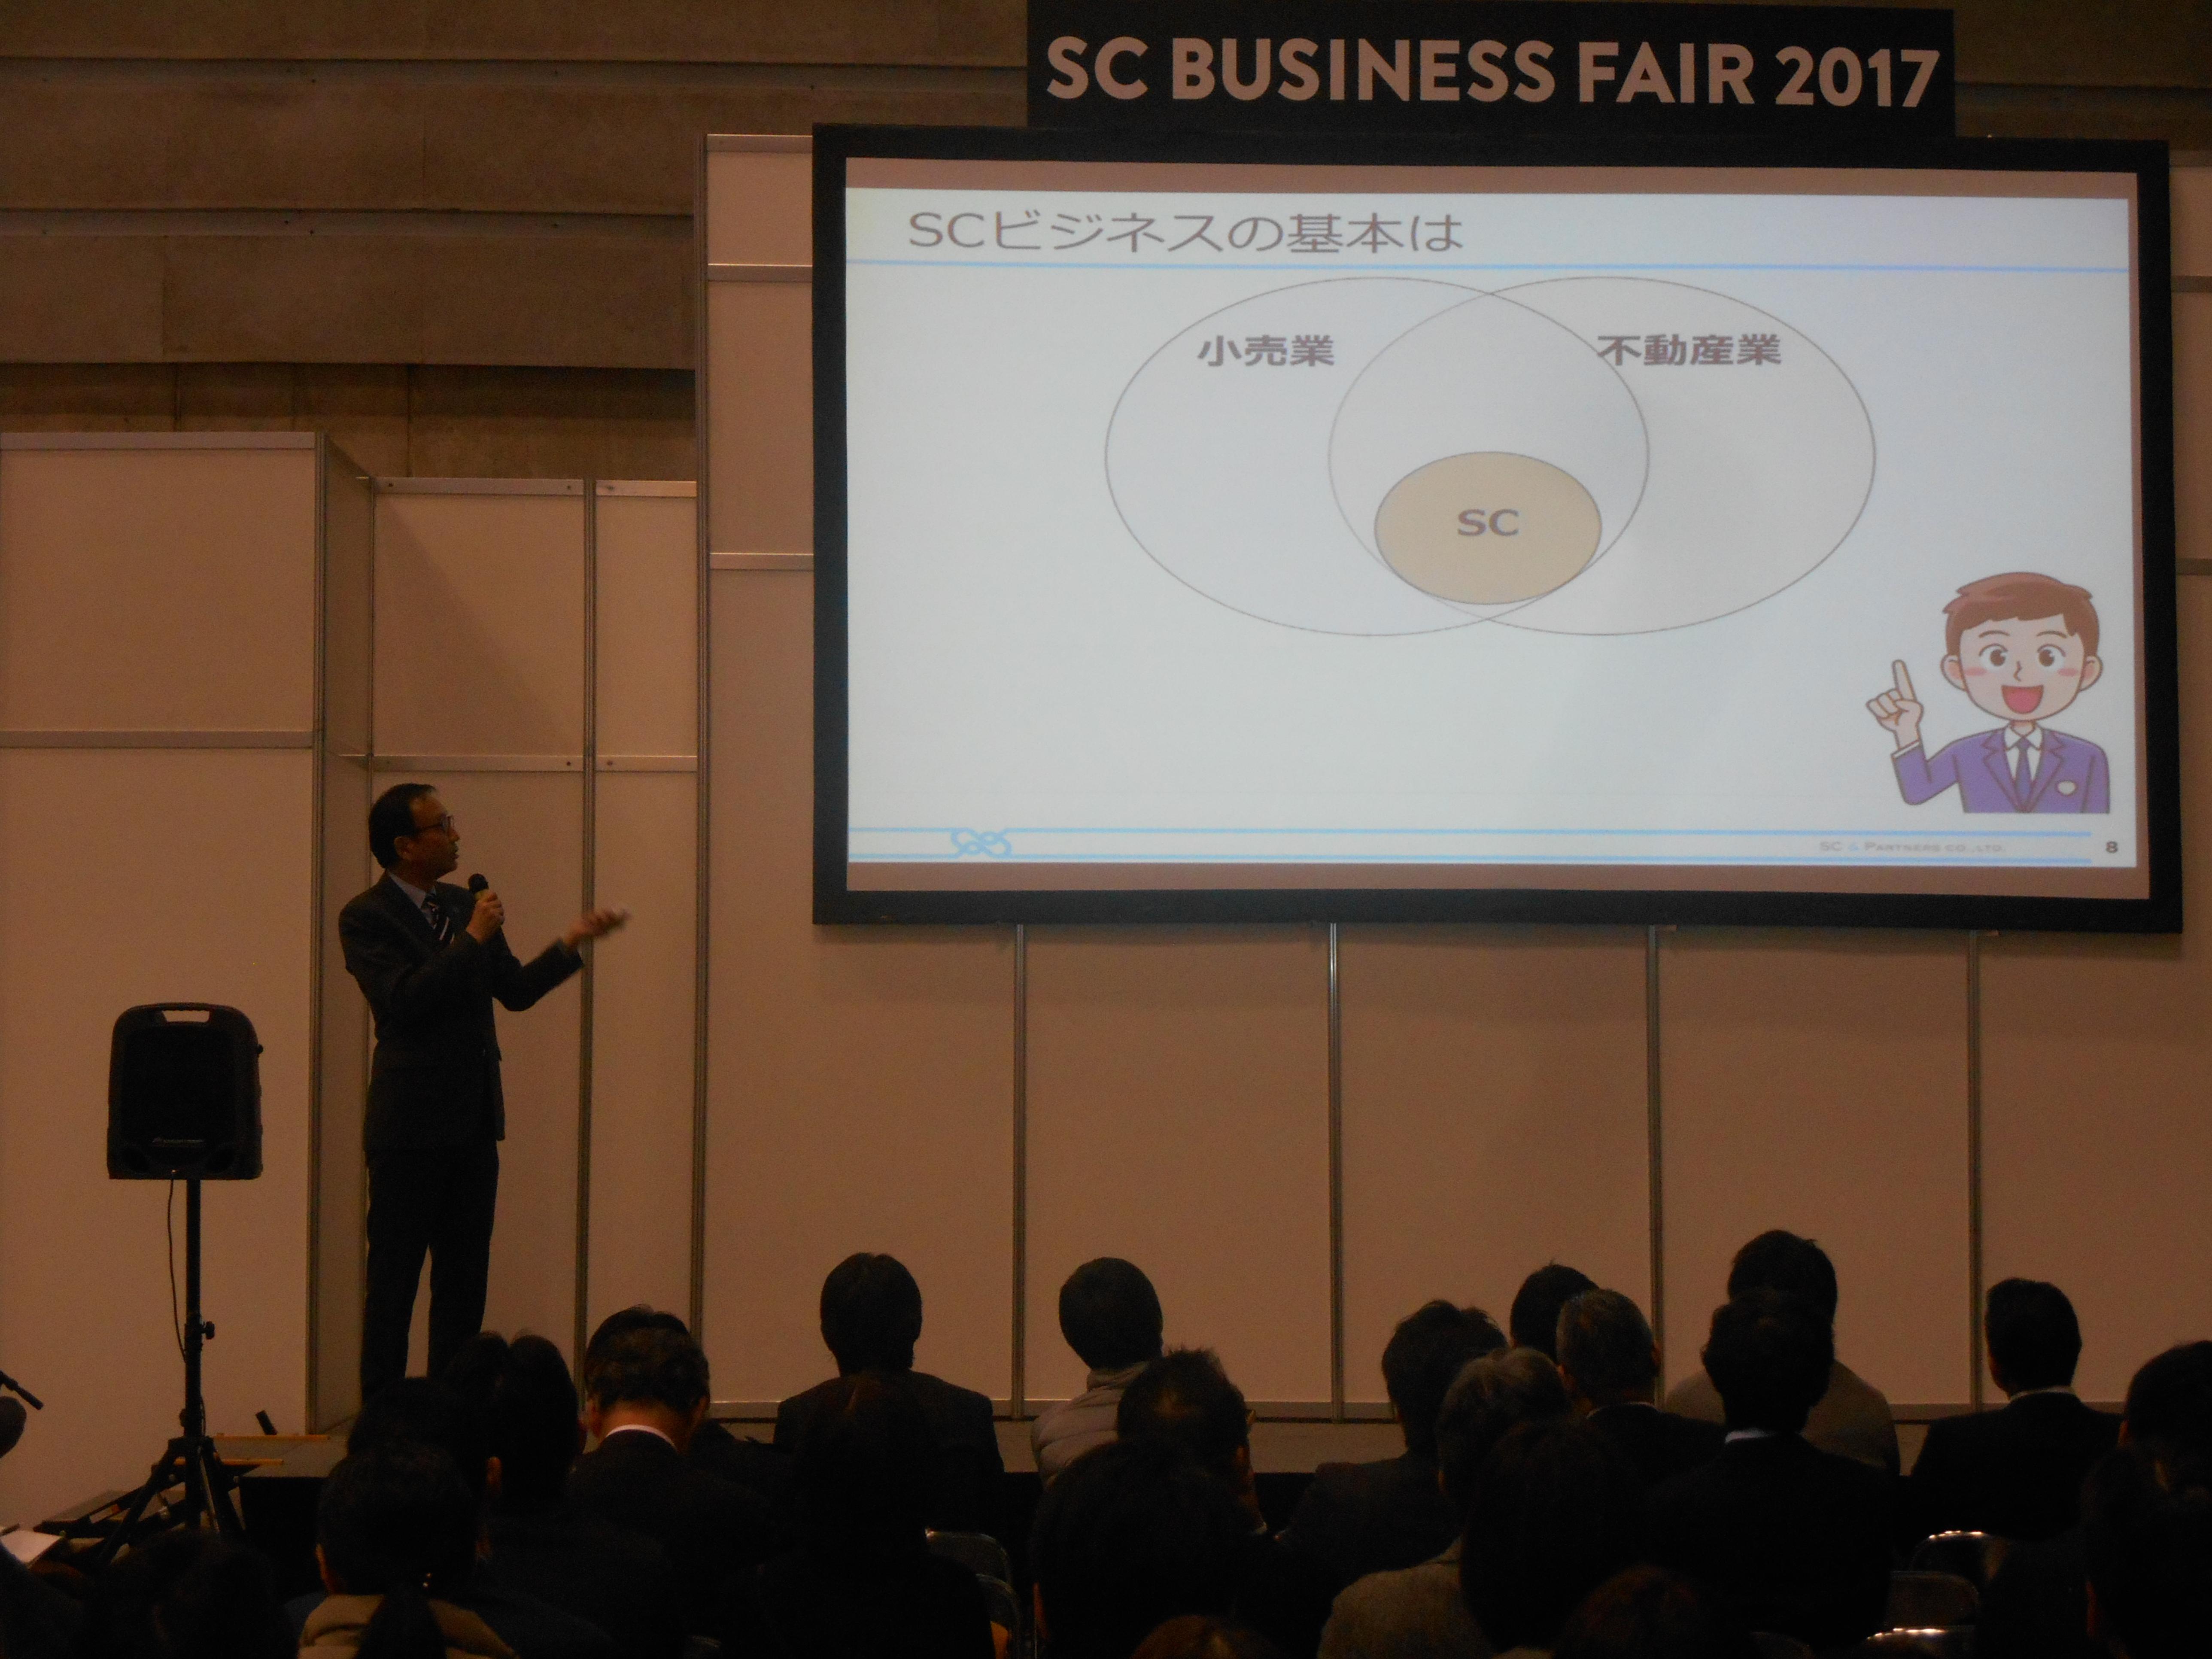 DSCN0022 - SC経営セミナー